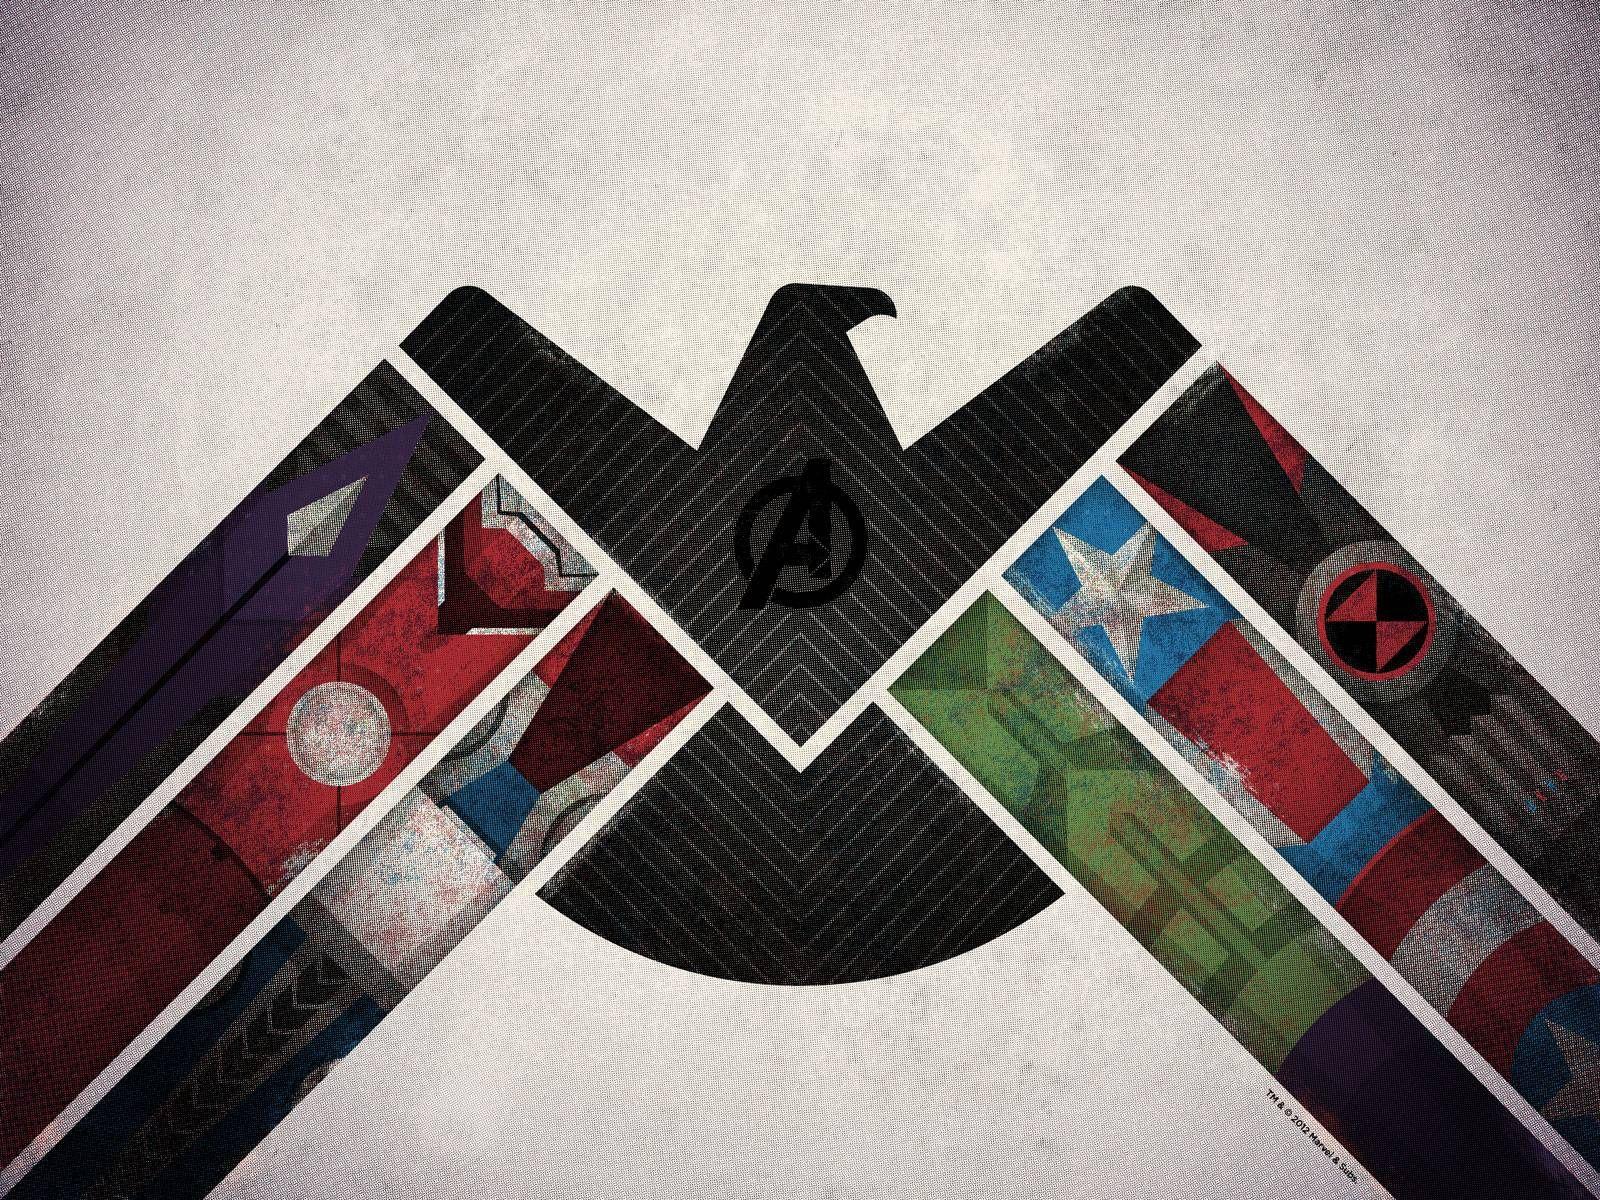 avengers desktop wallpapers - wallpaper cave | avengers | pinterest